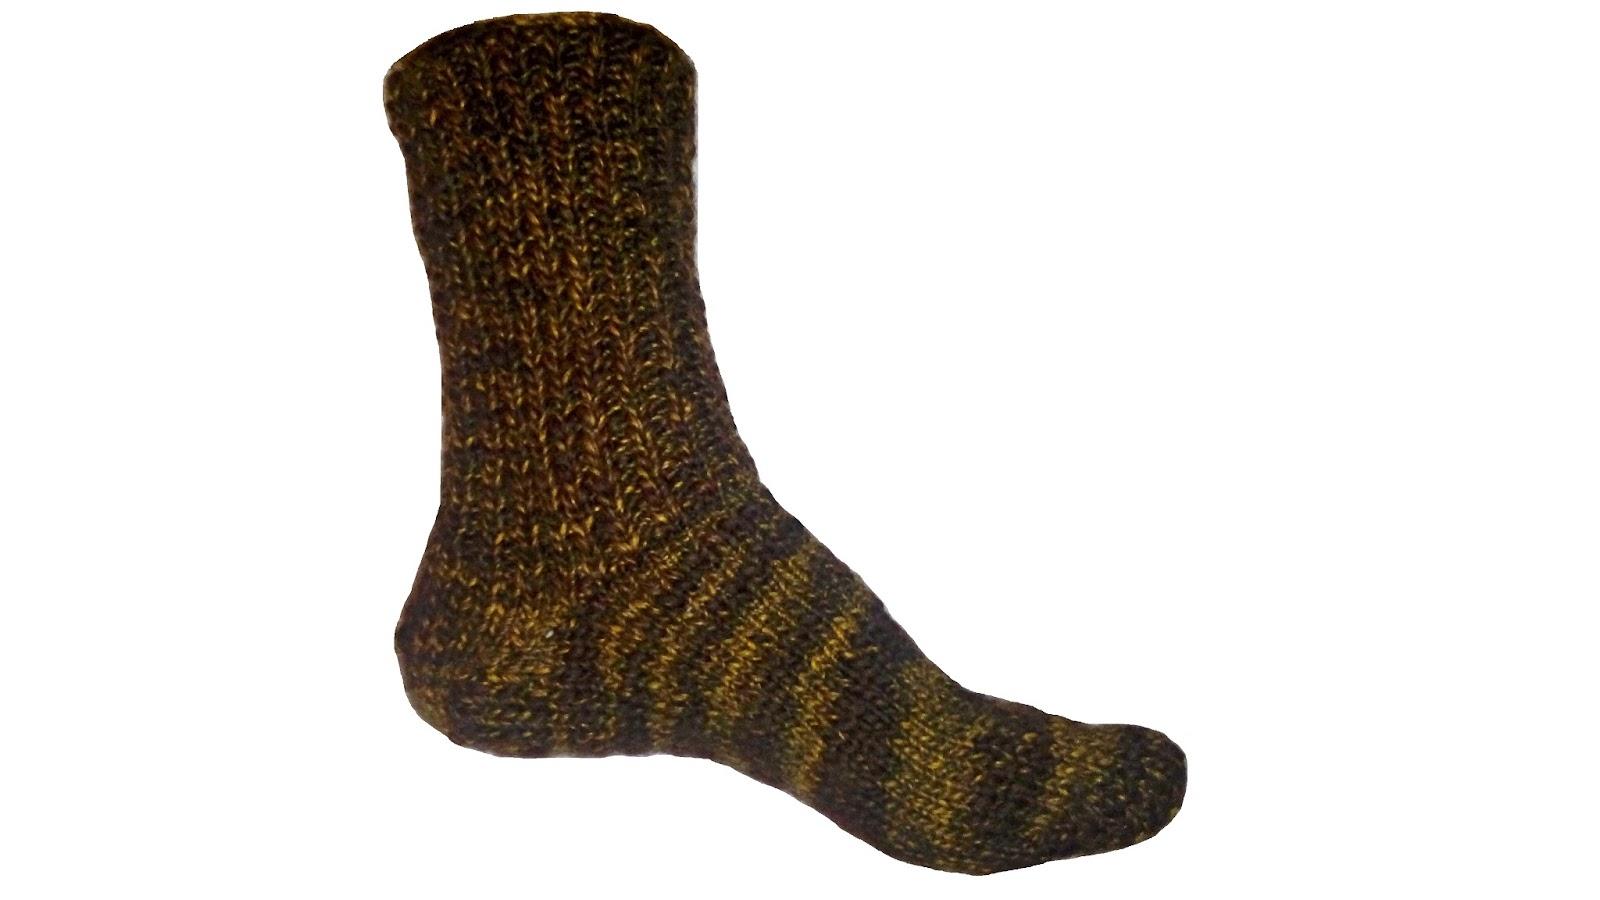 2 toe-up socks